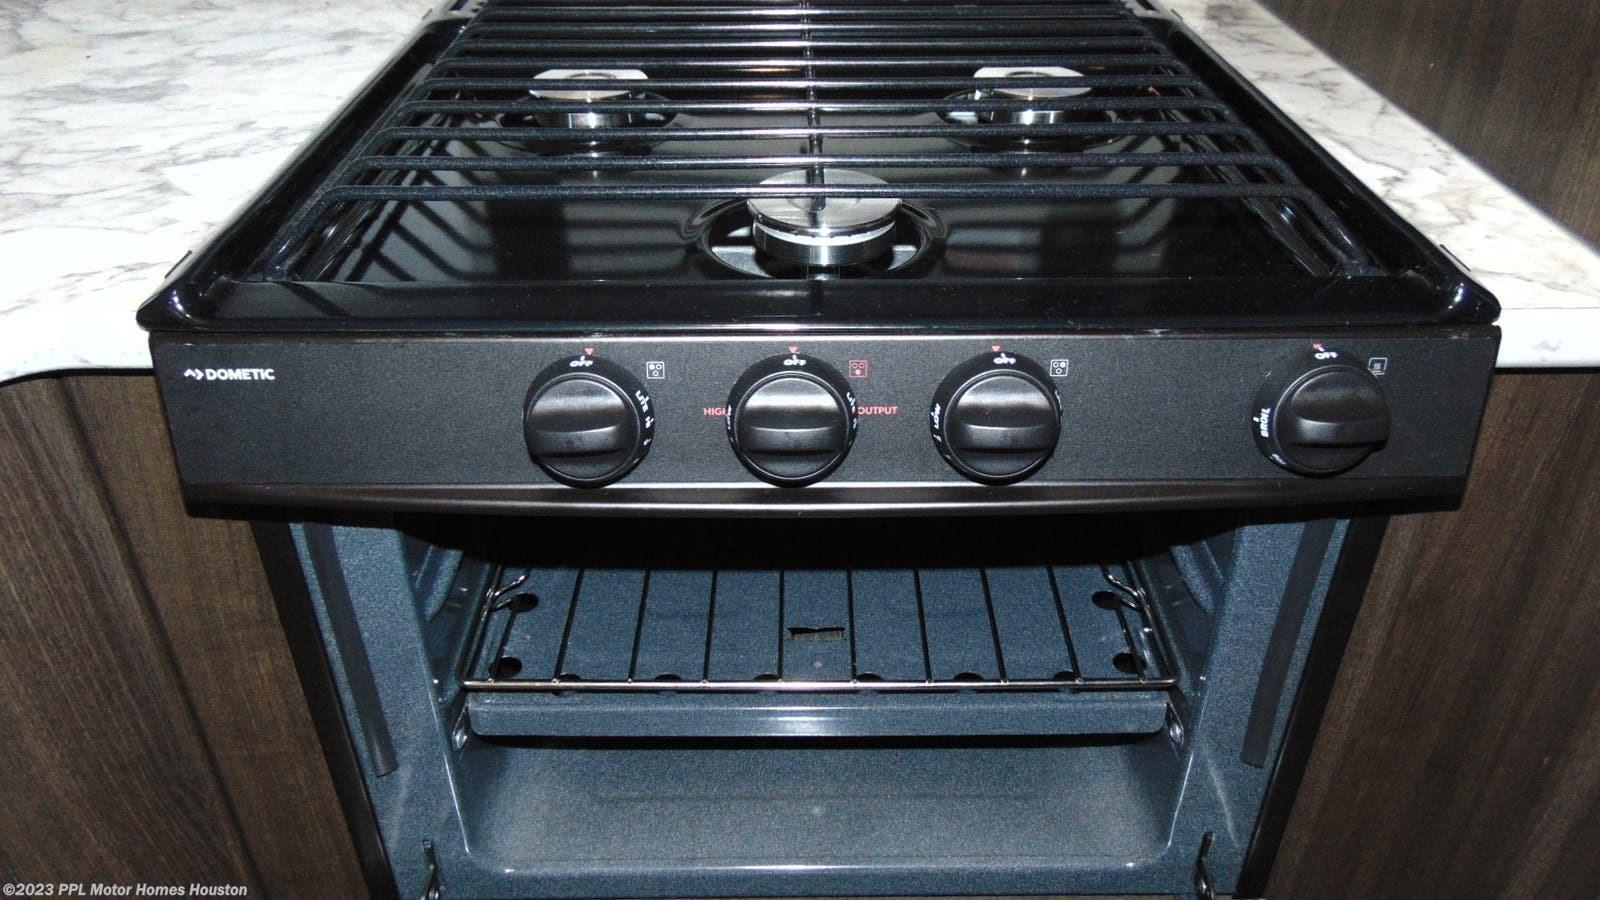 Rv Stovesovens Microwaves Parts Ppl Motor Homes >> 2018 Keystone Rv Springdale 235rb For Sale In Houston Tx 77074 T349